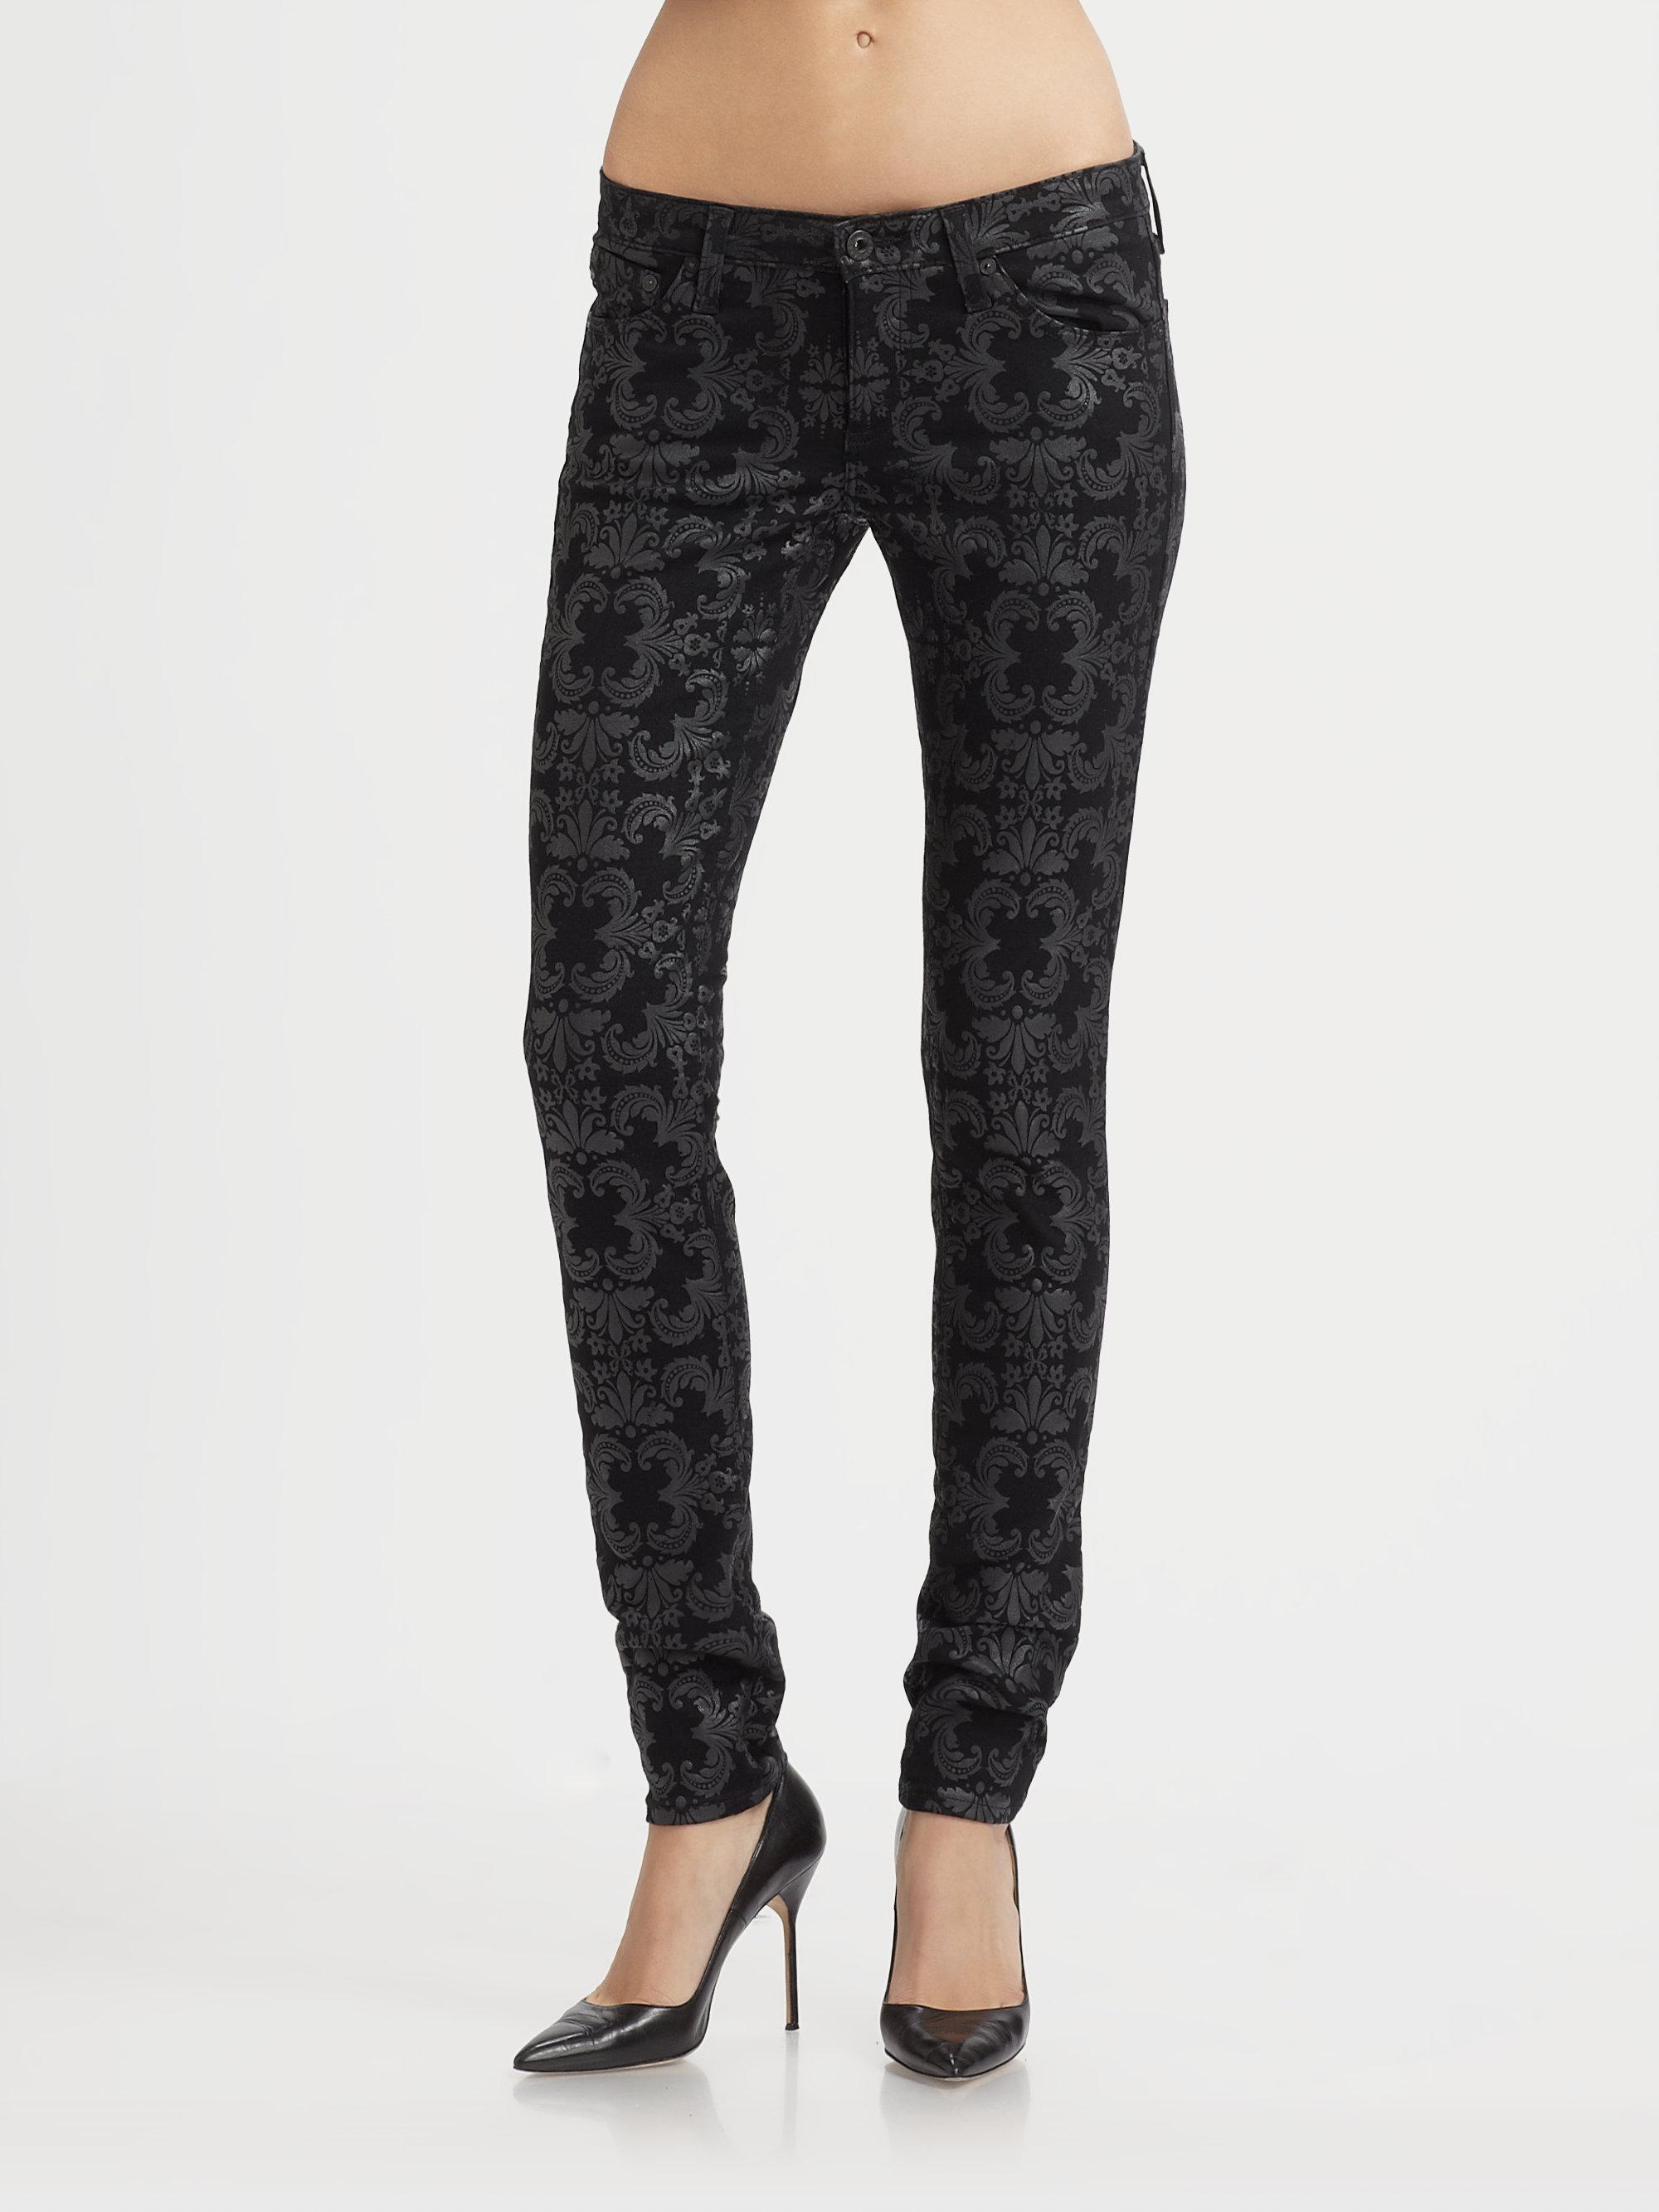 Ag jeans Printed Skinny Jeans in Floral (black) | Lyst